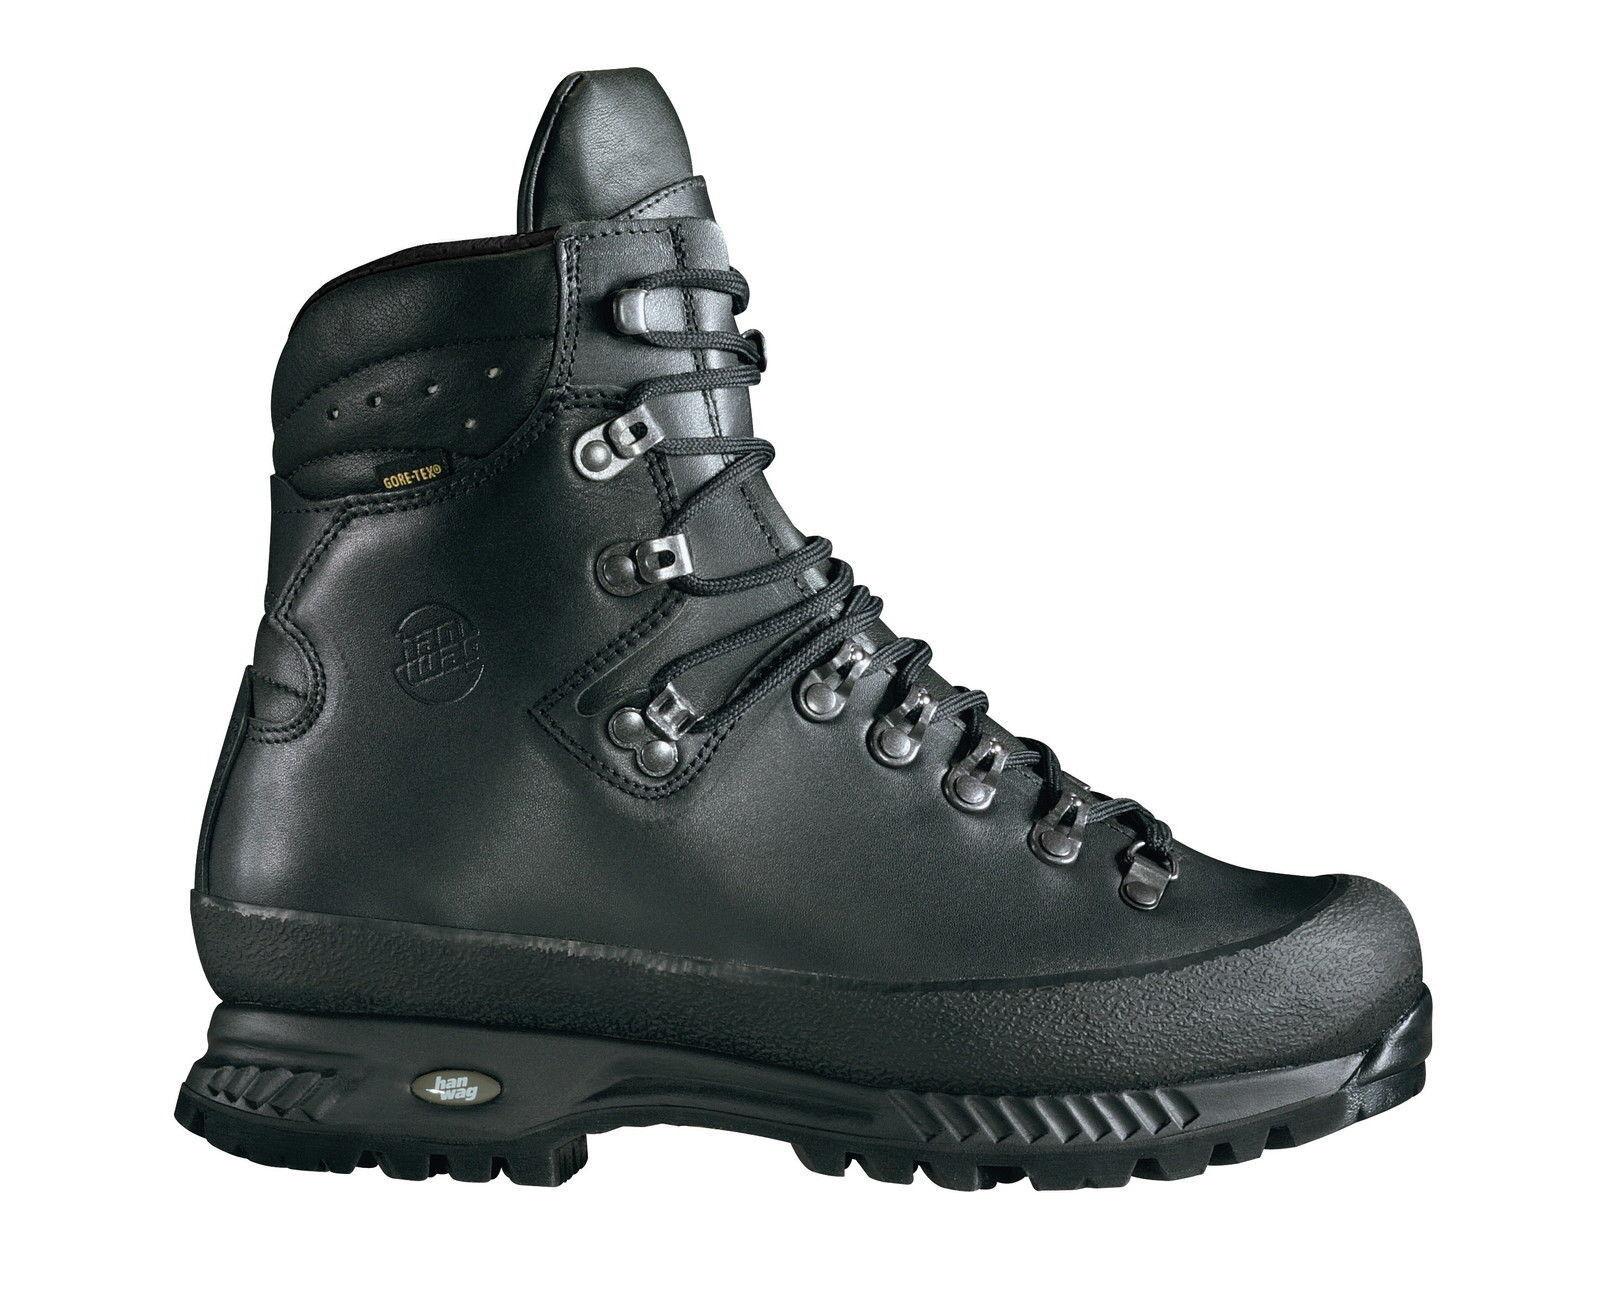 Hanwag Bergschuhe:Alaska GTX Lady Größe 6 - - 6 39,5 schwarz e2a638